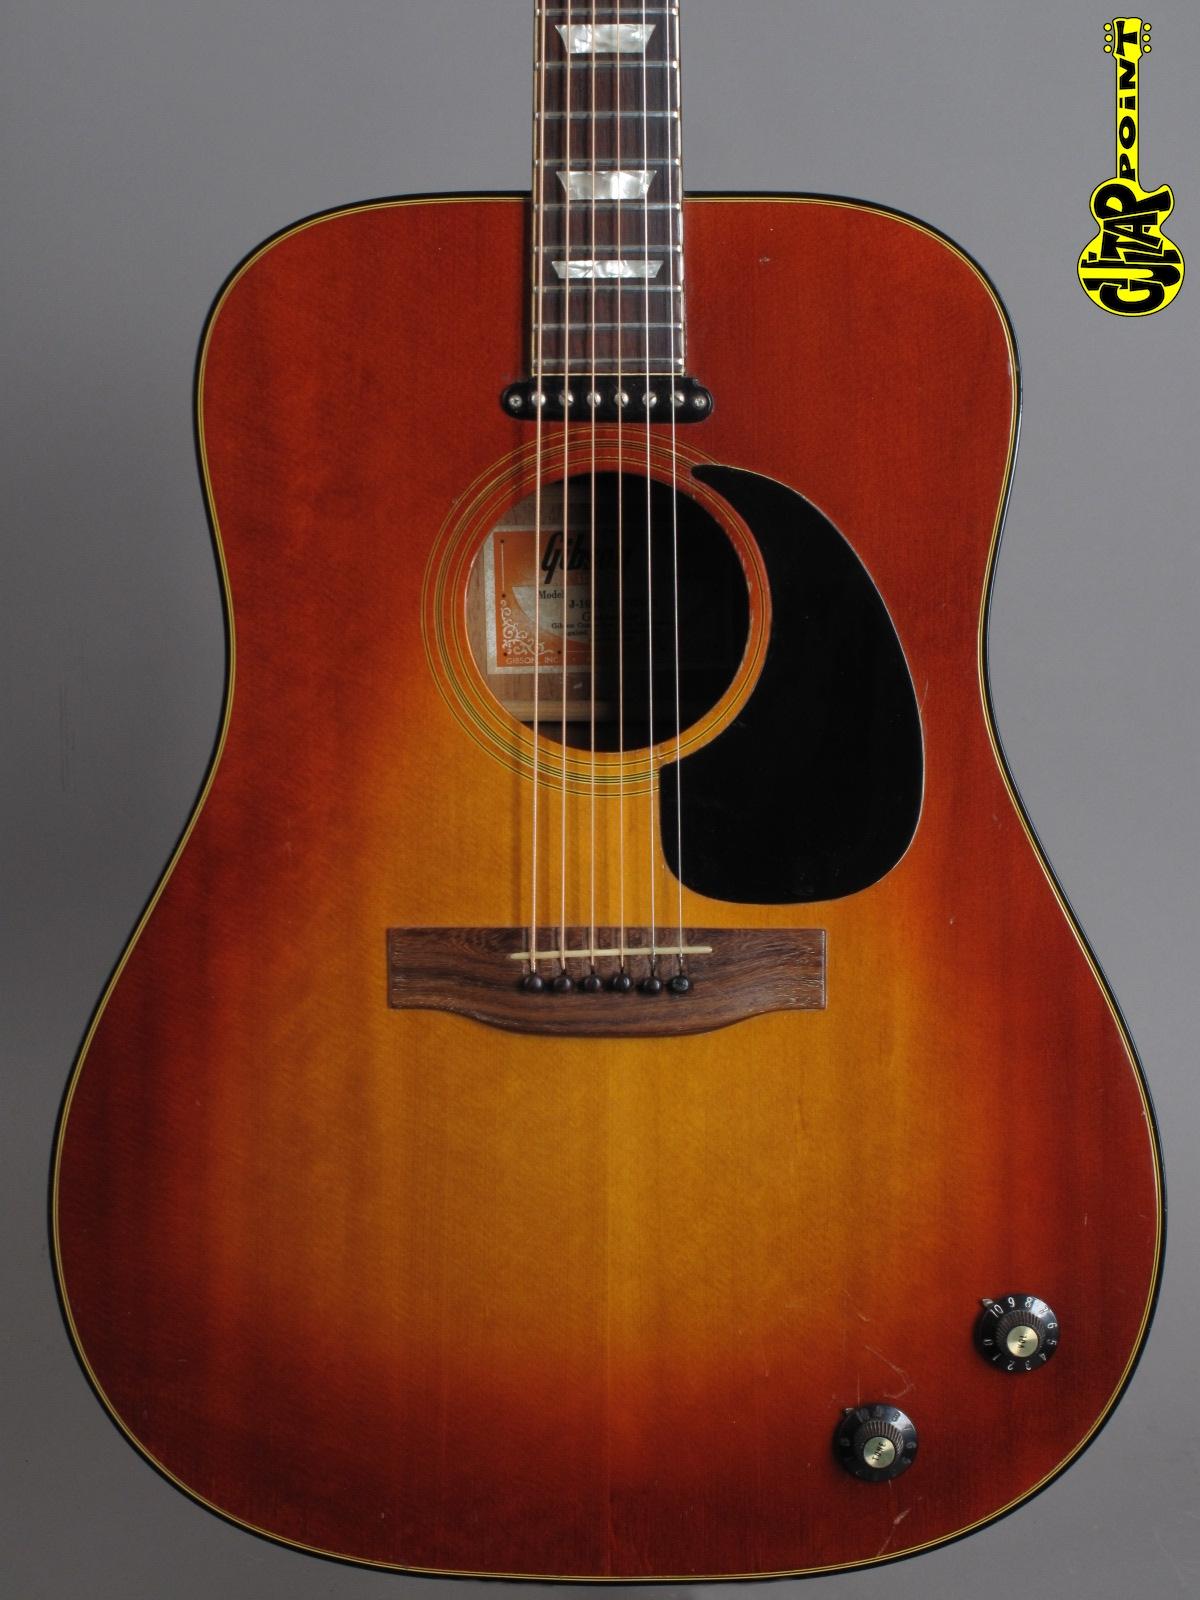 1976 Gibson EJ-160E - Sunburst